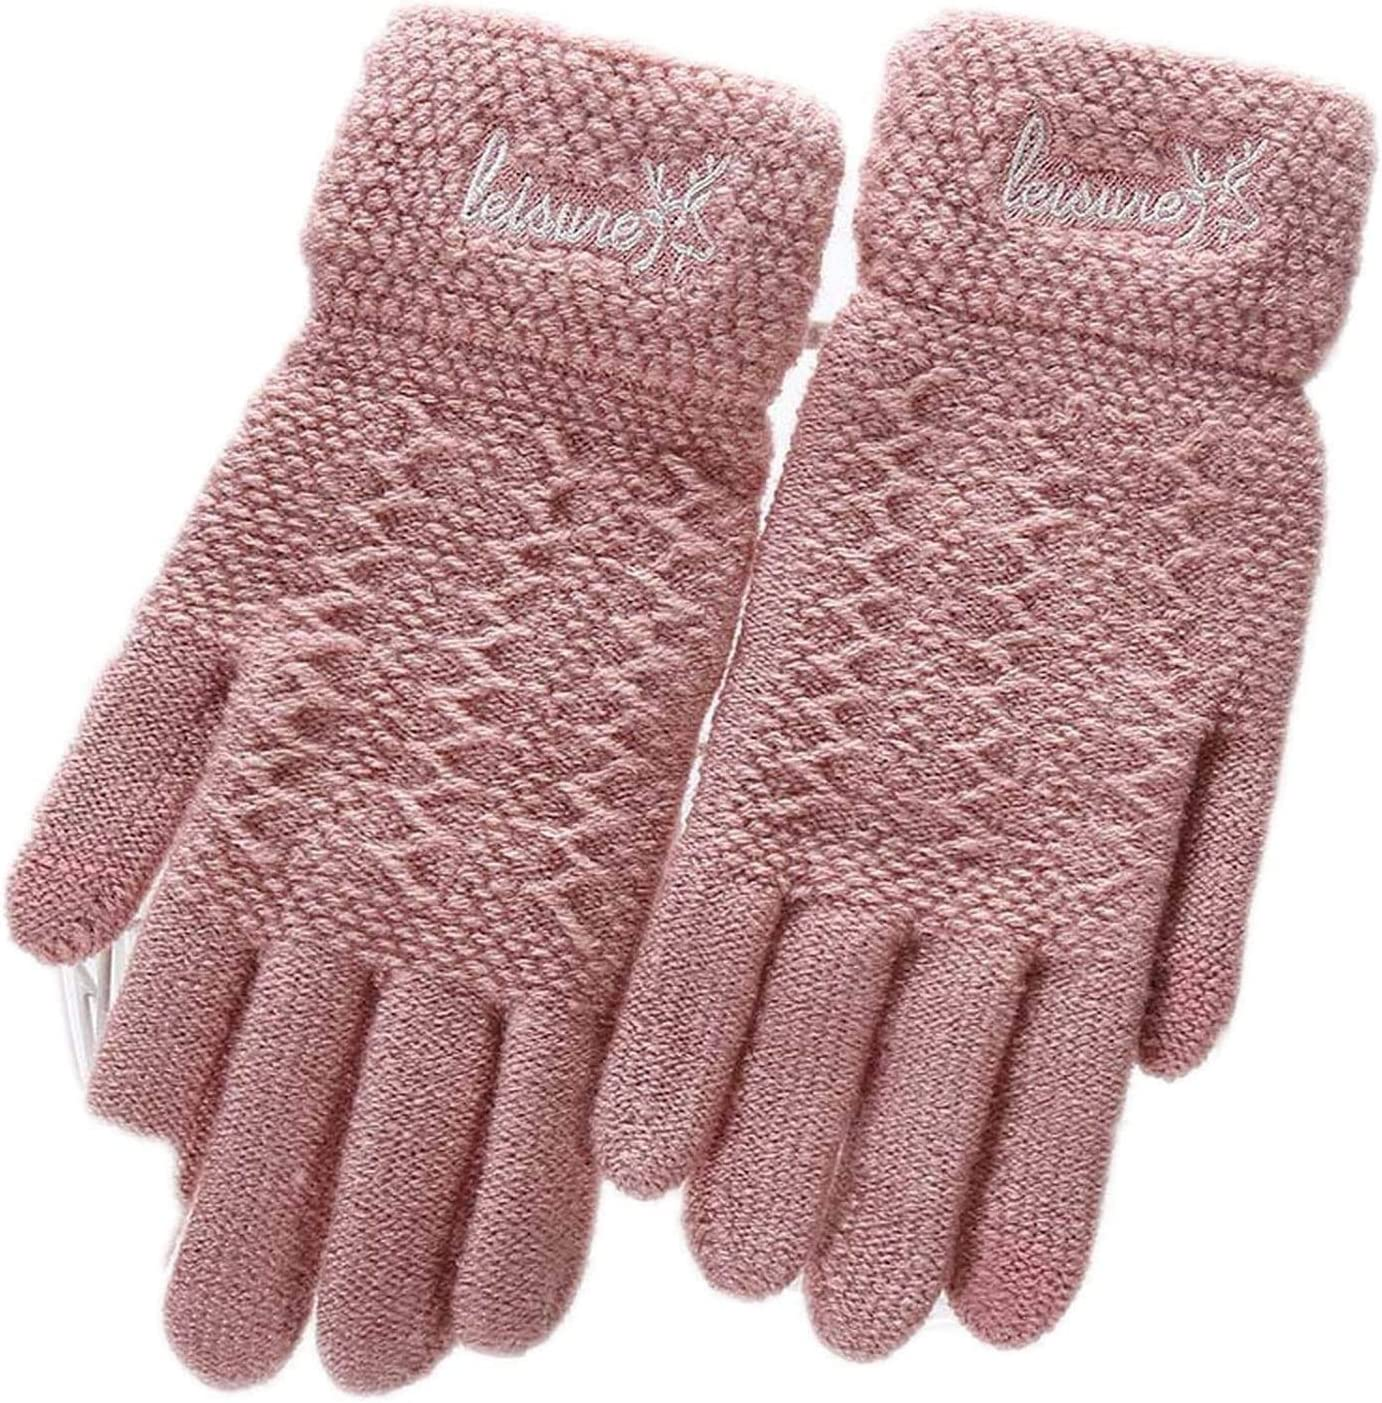 Samantha Warm Gloves Ladies Winter Warm Cute Cartoon Finger Knit Touch Screen Gloves Women Full Finger Soft Mittens Black Gloves (Color : E Pink, Size : Oneszie)